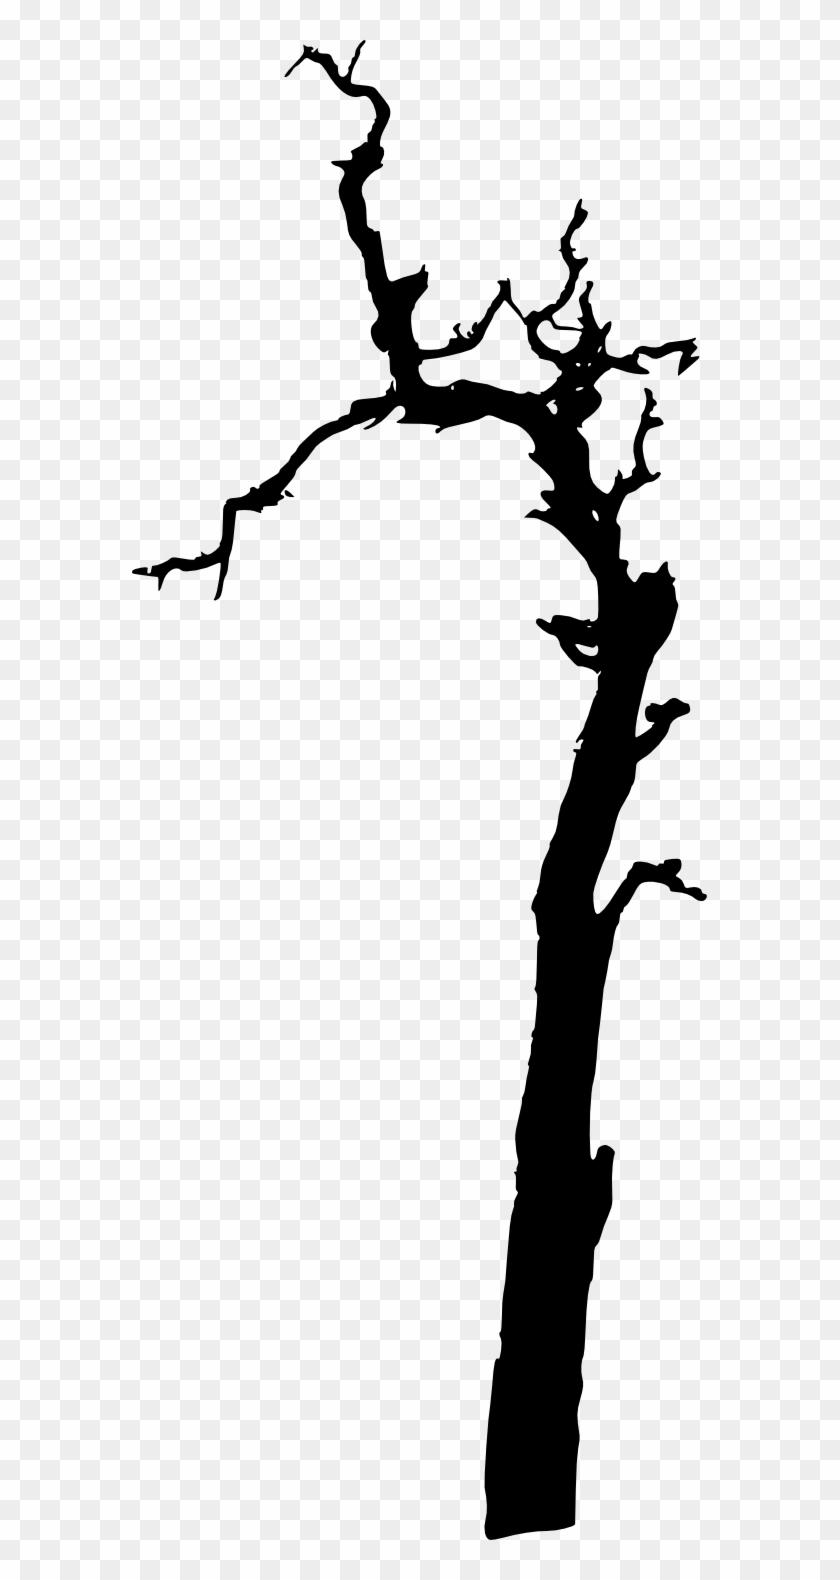 17 Dead Tree Silhouette - 17 Dead Tree Silhouette #67